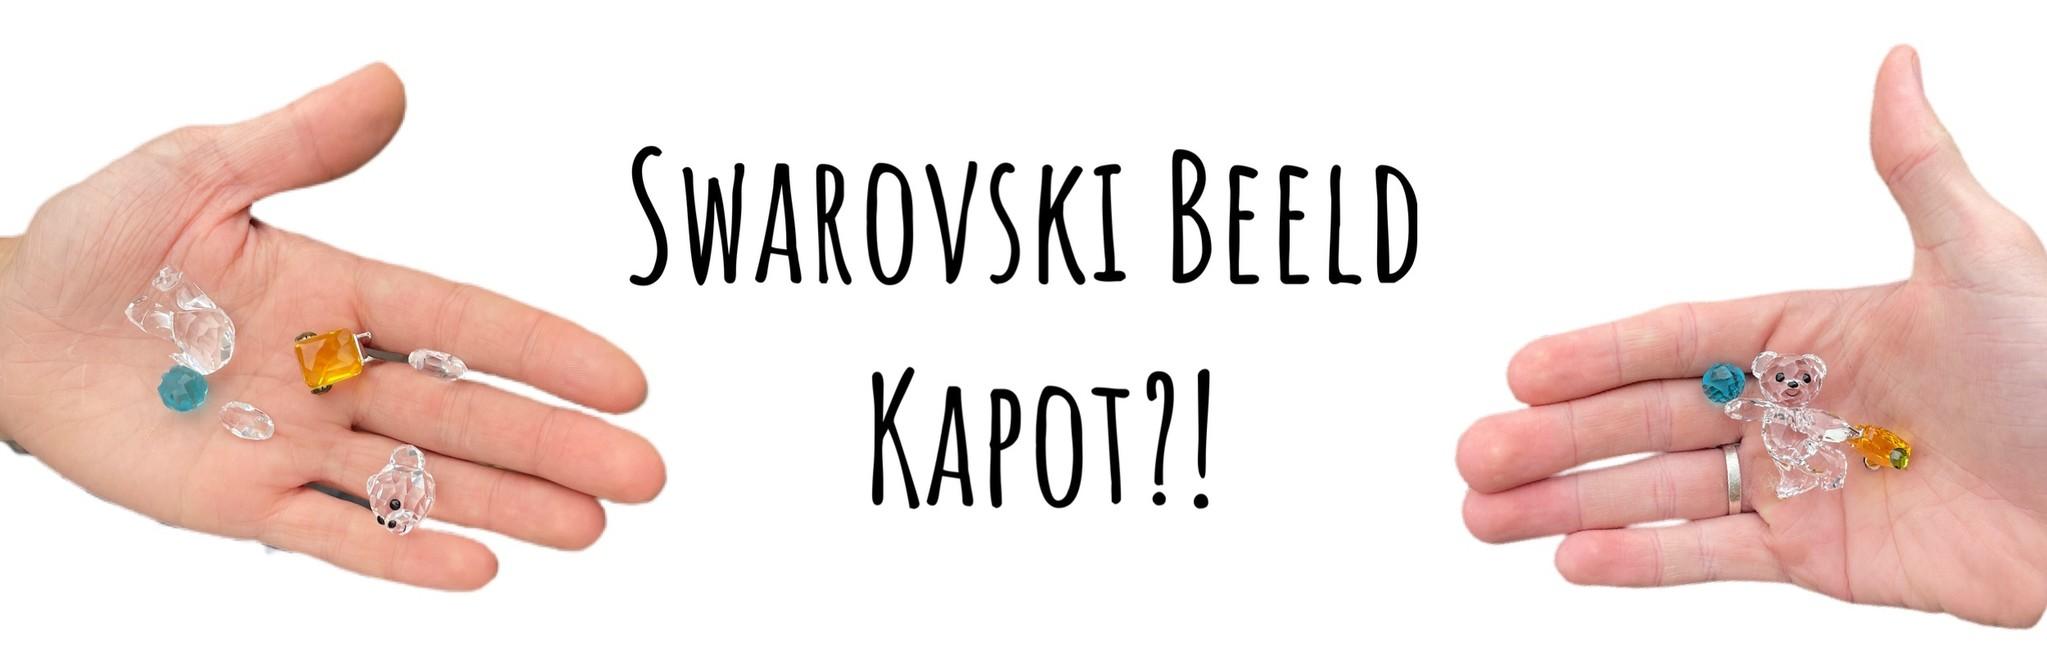 Swarovski Beeld Laten Maken